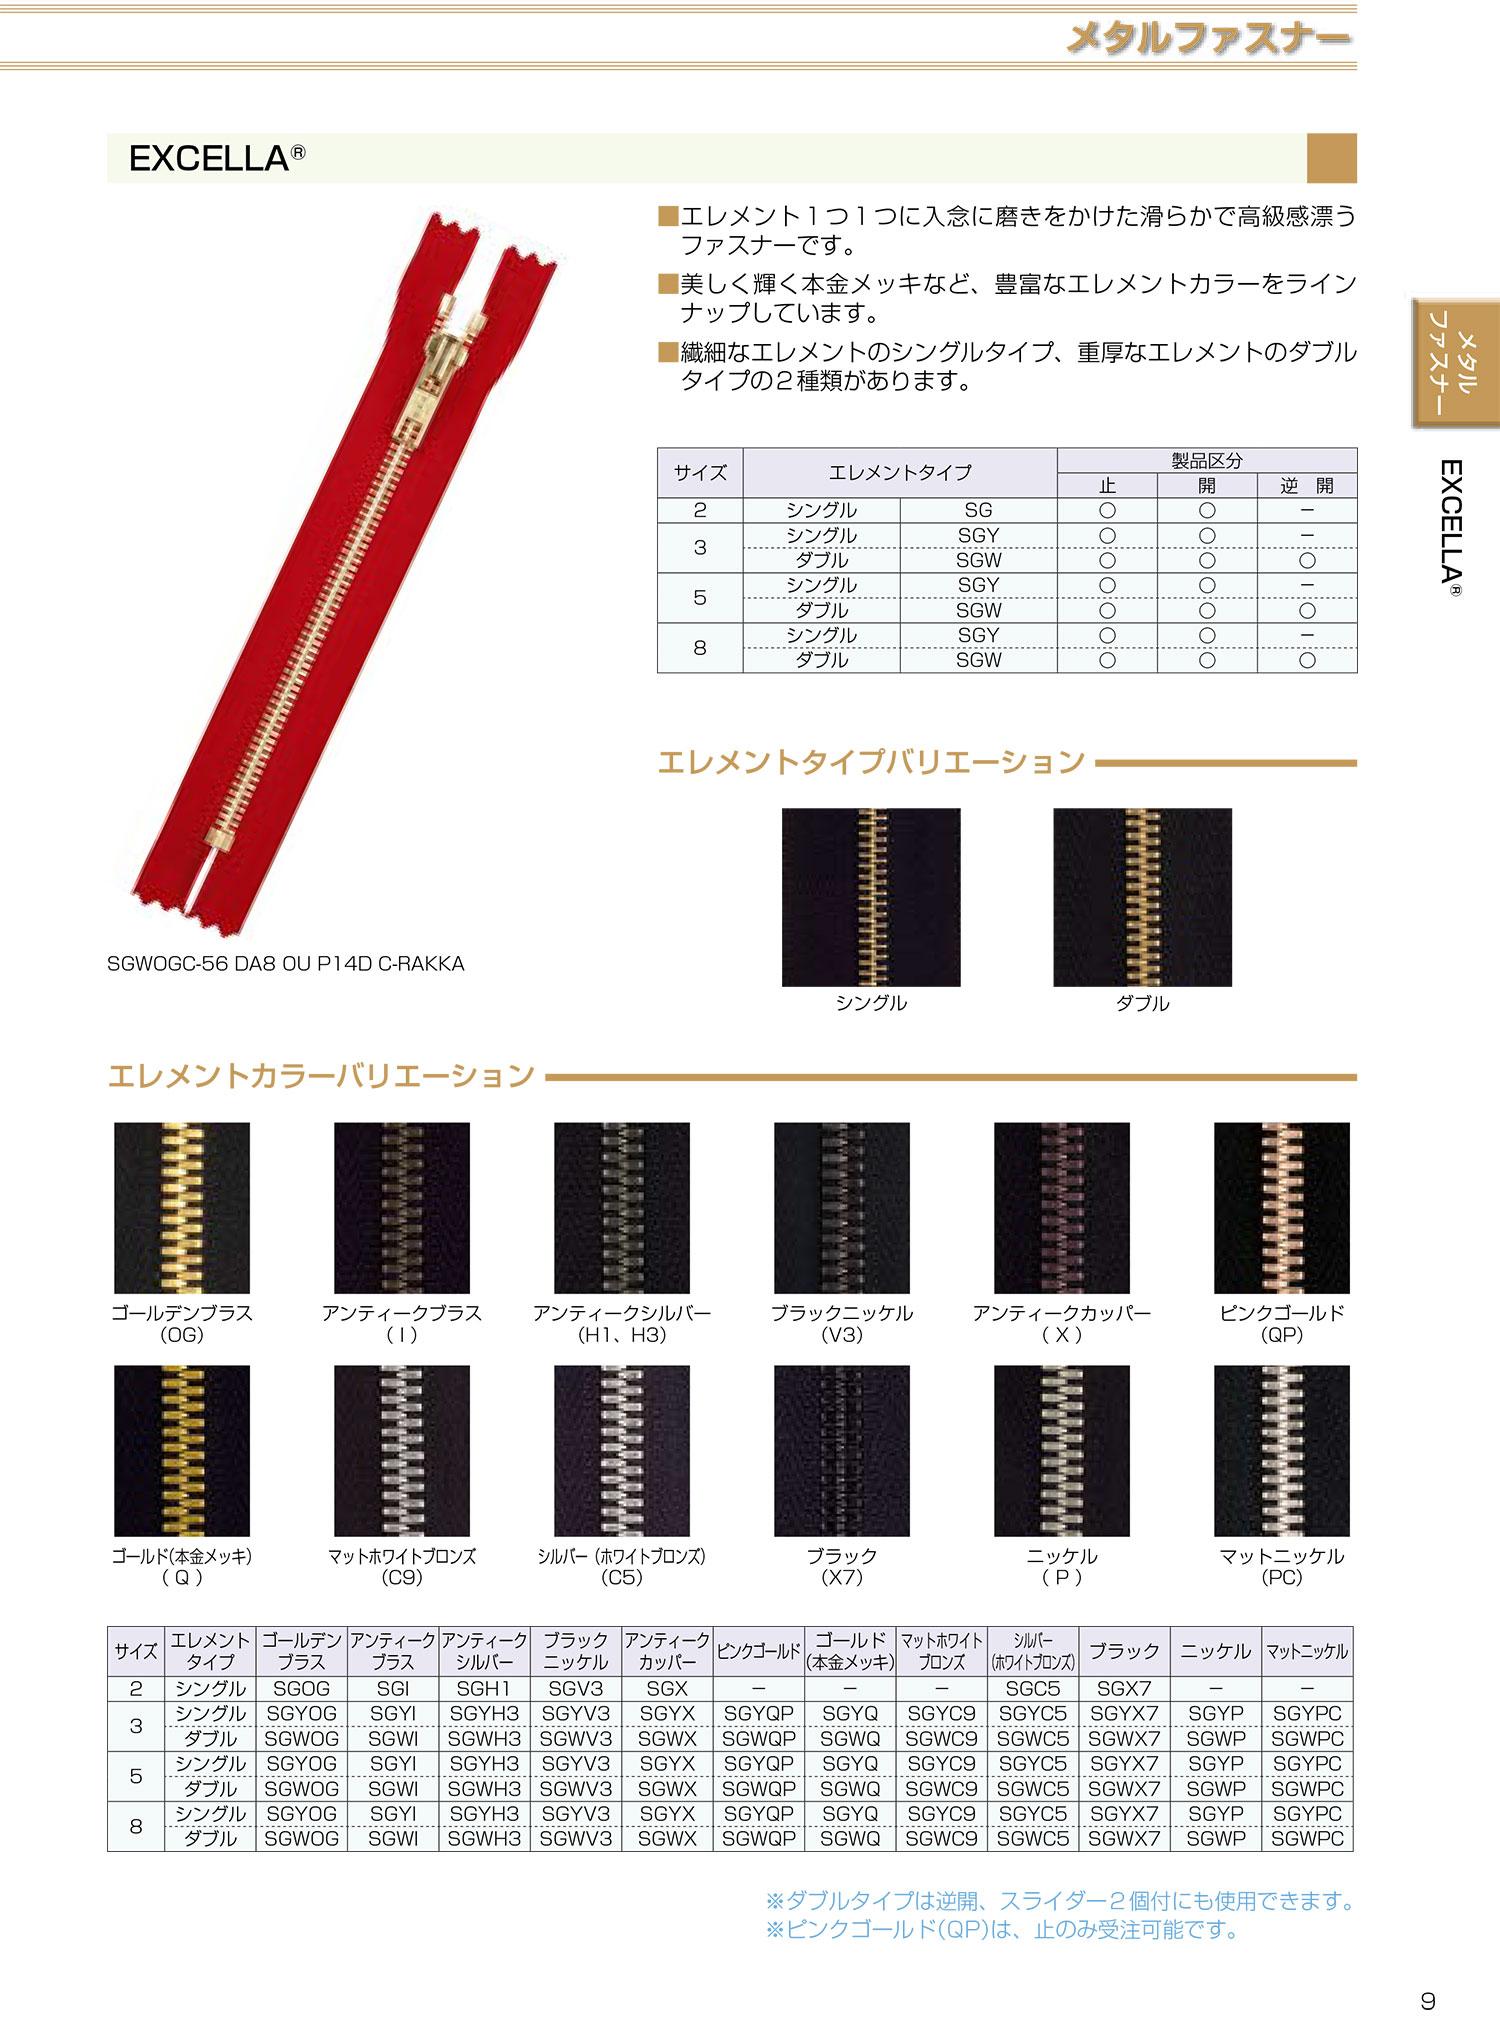 8SGWC9OR エクセラ 8サイズ マットホワイトブロンズ オープン ダブル[ファスナー] YKK/オークラ商事 - ApparelX アパレル資材卸通販